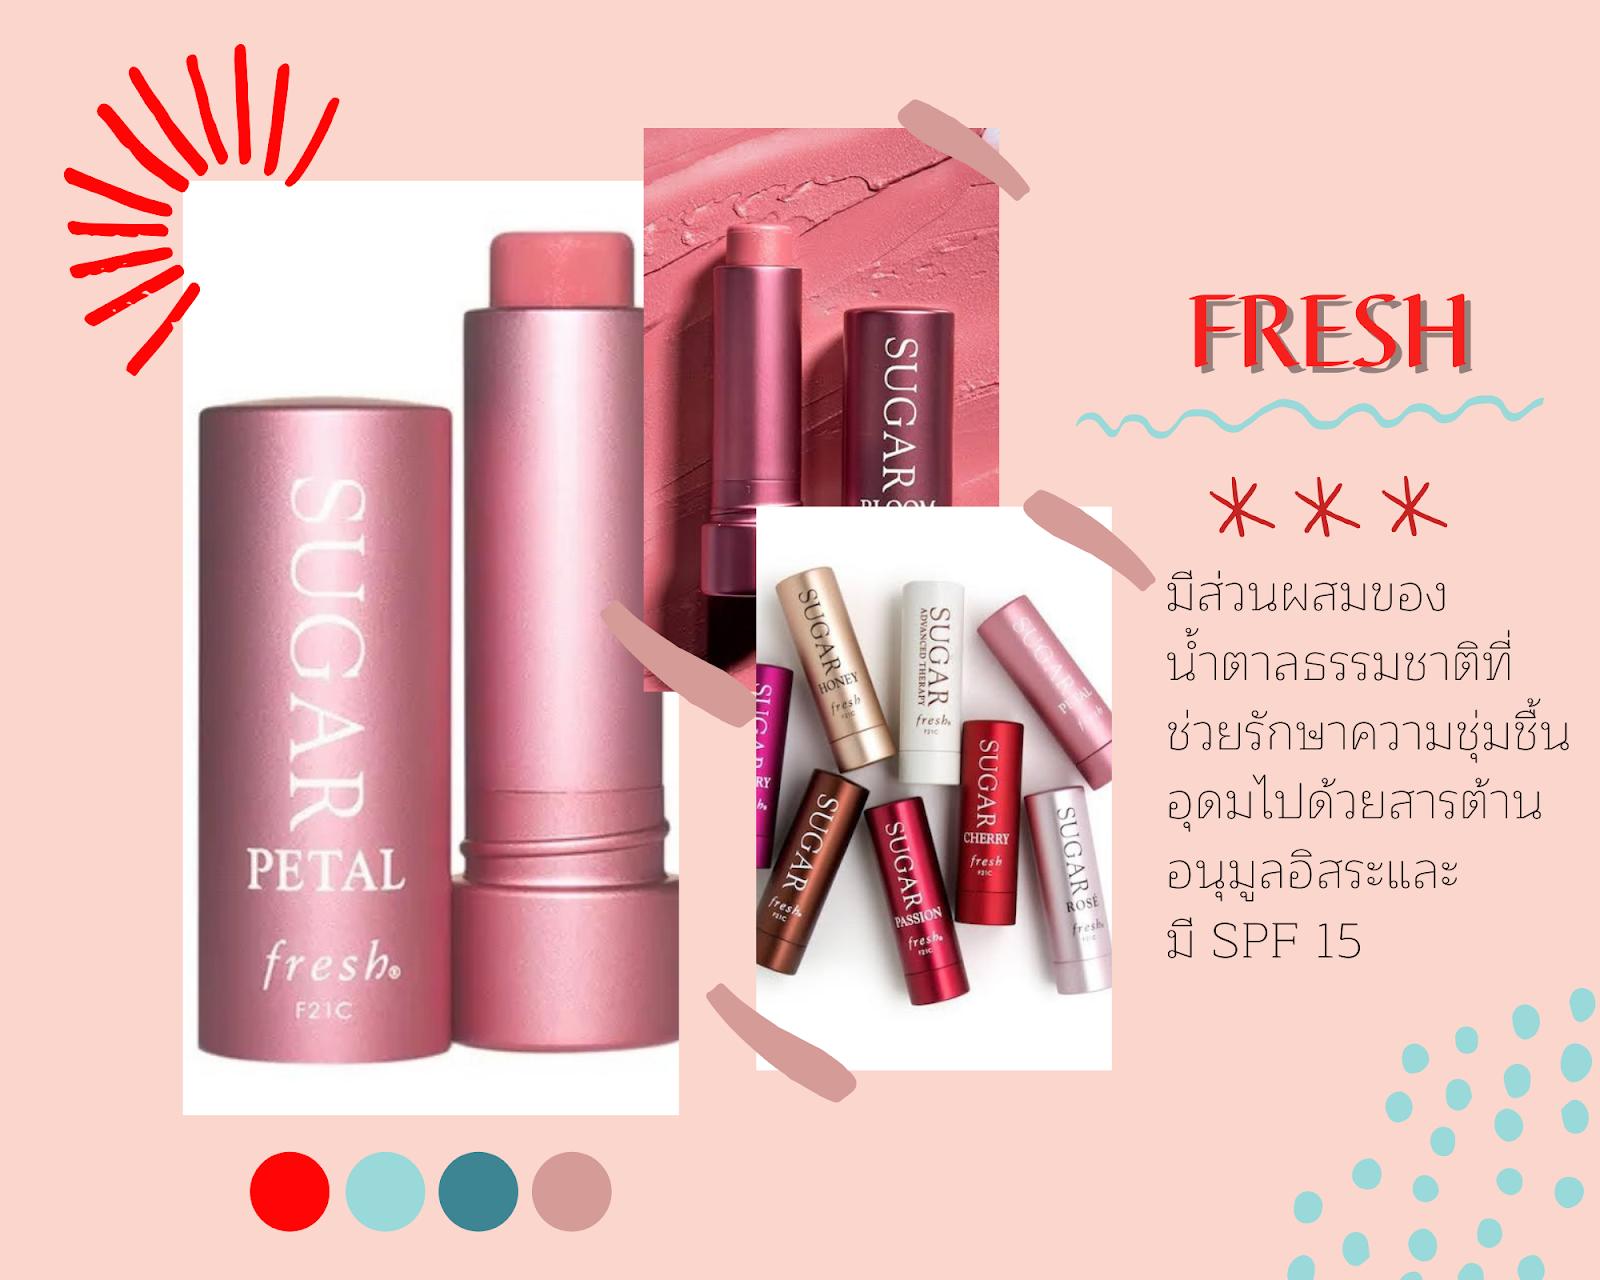 6. Sugar Lip Treatment Sunscreen SPF 15